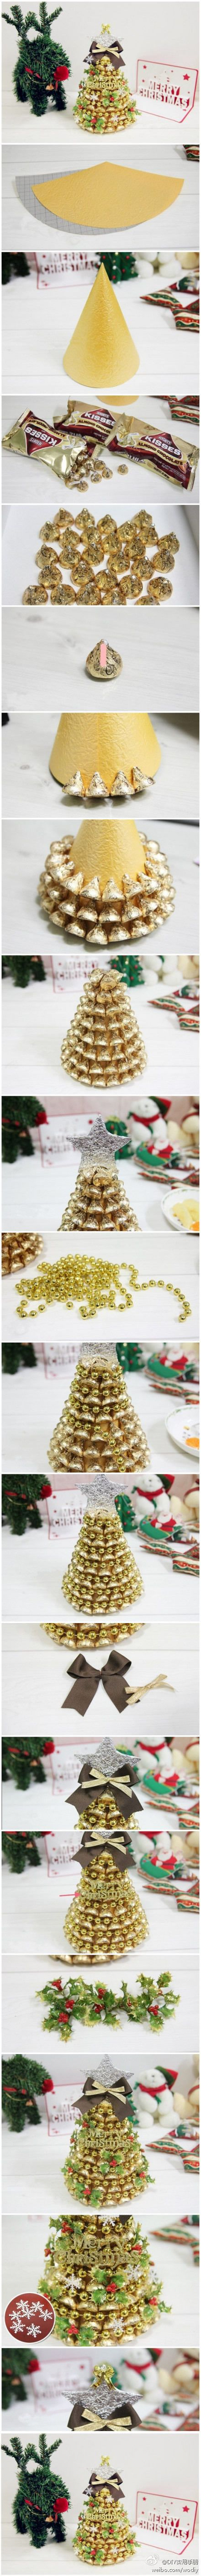 hershey kiss christmas tree. On the desert table